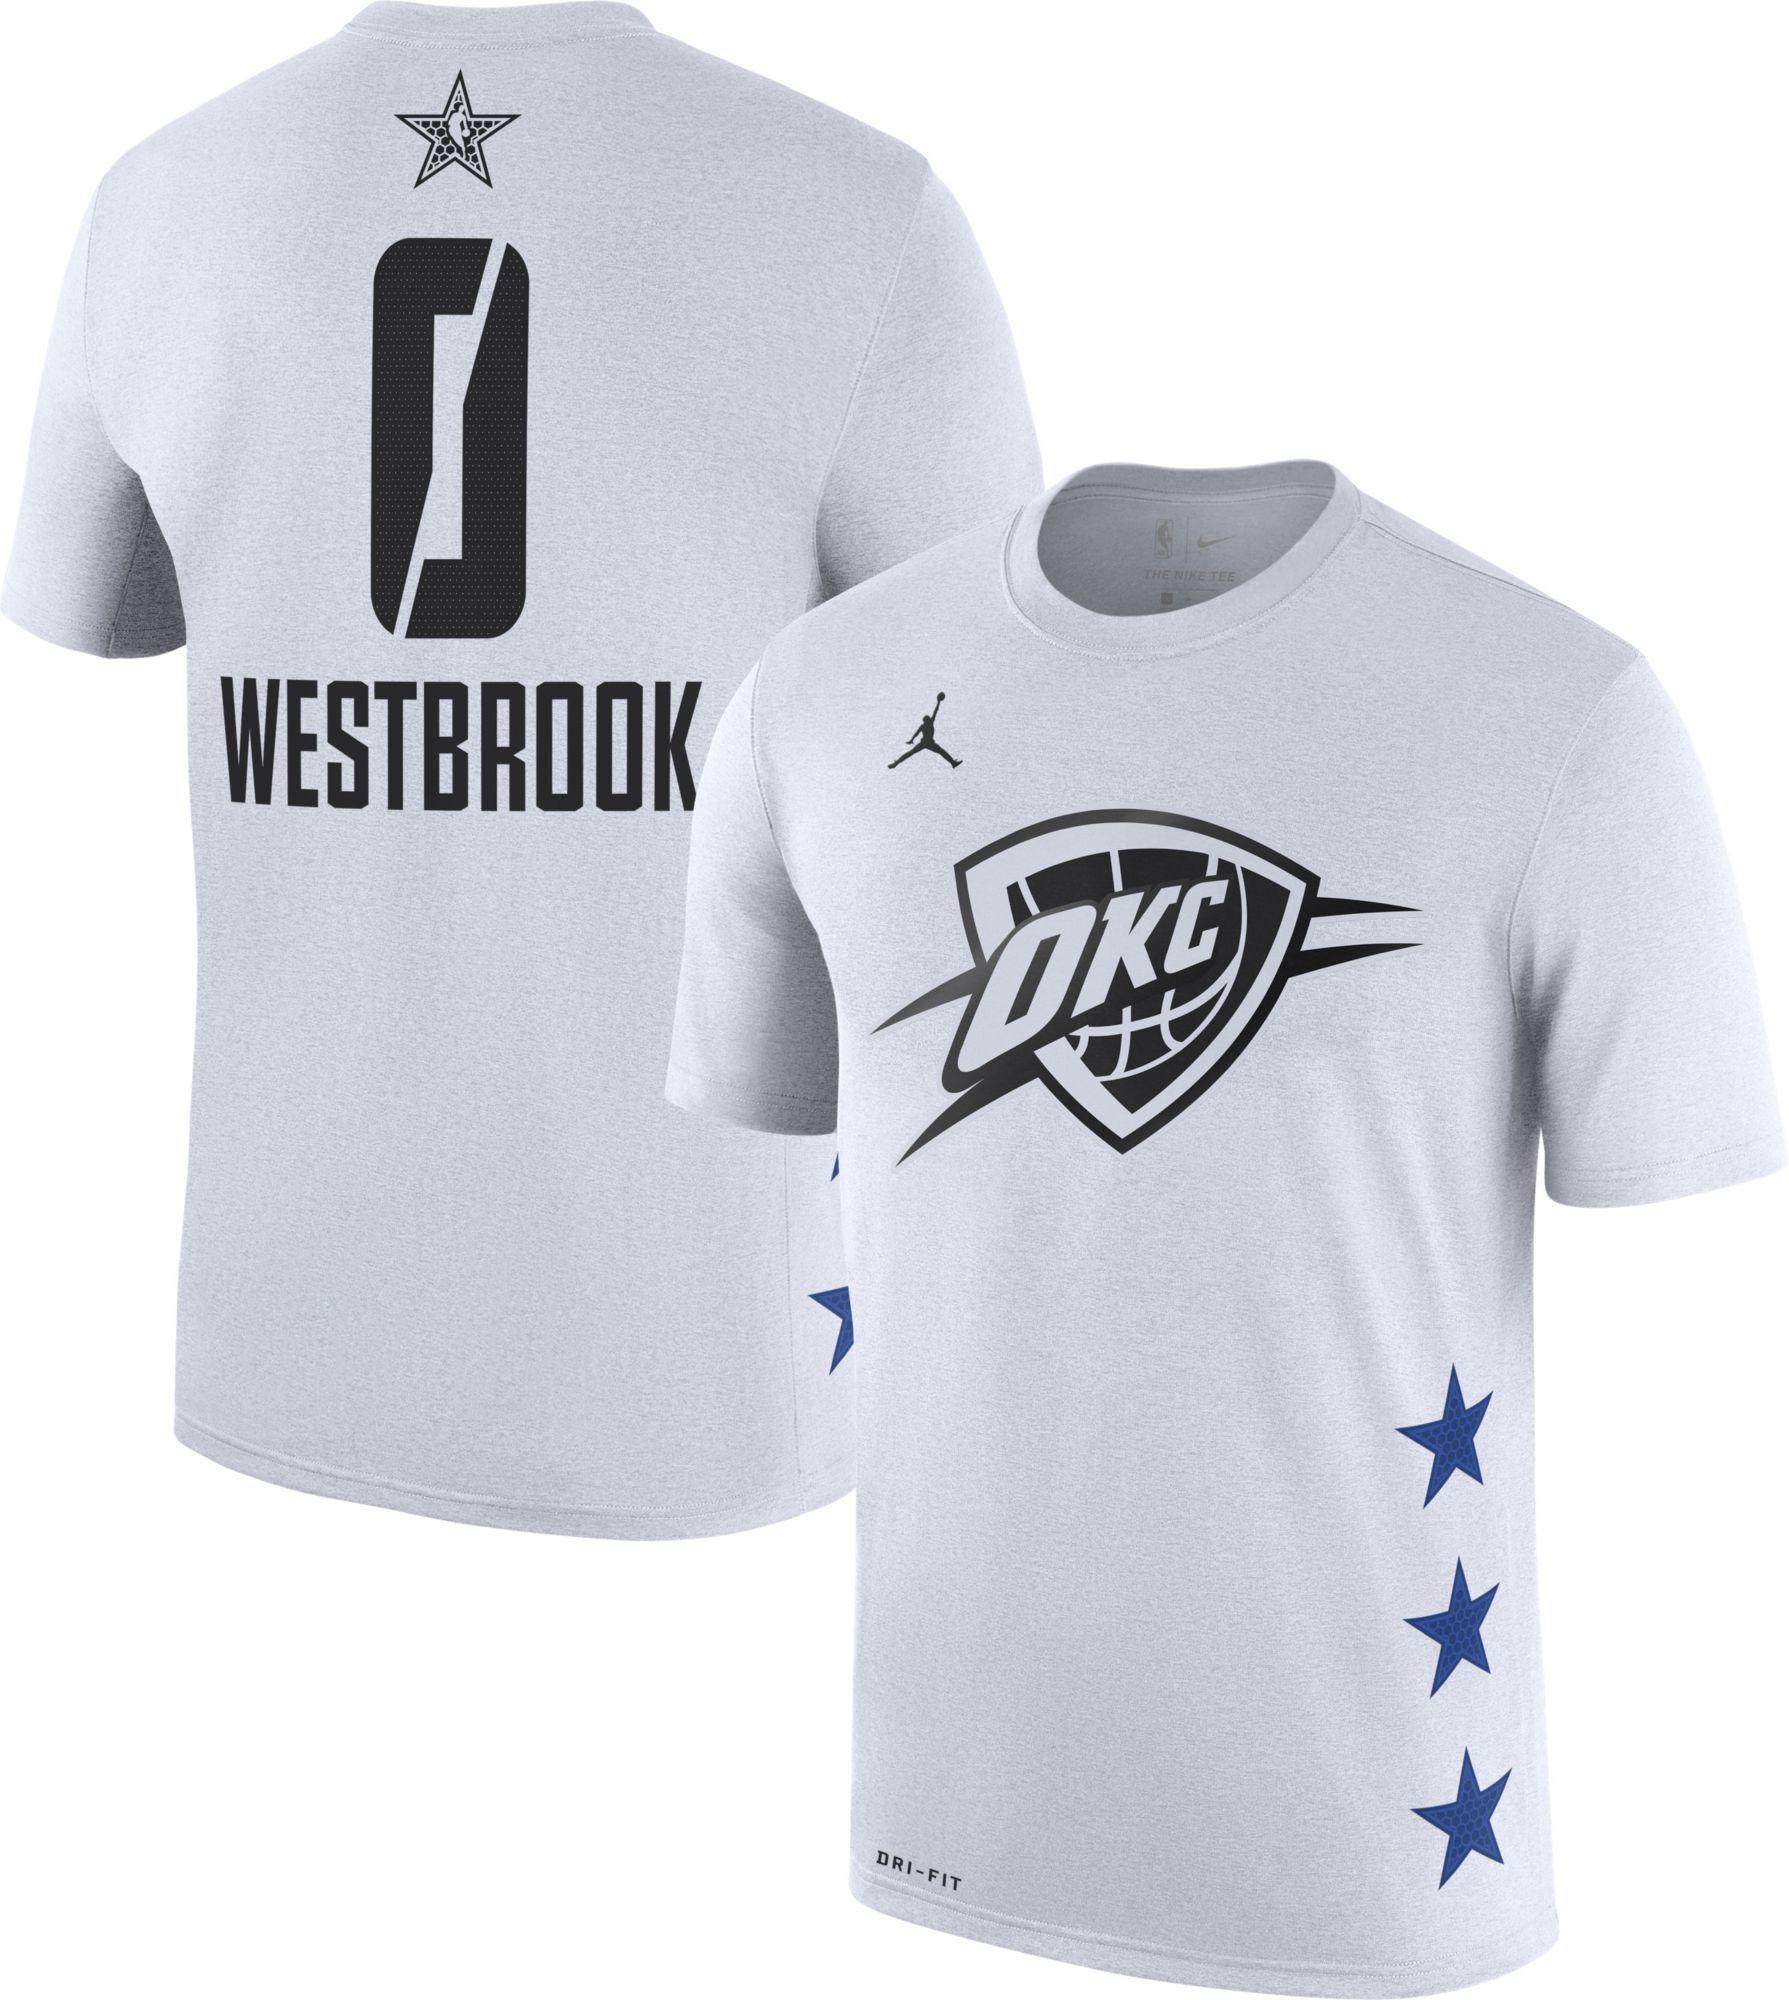 07f8ed570bf Jordan Youth 2019 NBA All-Star Game Anthony Davis Dri-FIT White T-Shirt in  2019 | Products | Jumpman logo, Shirts, T shirt